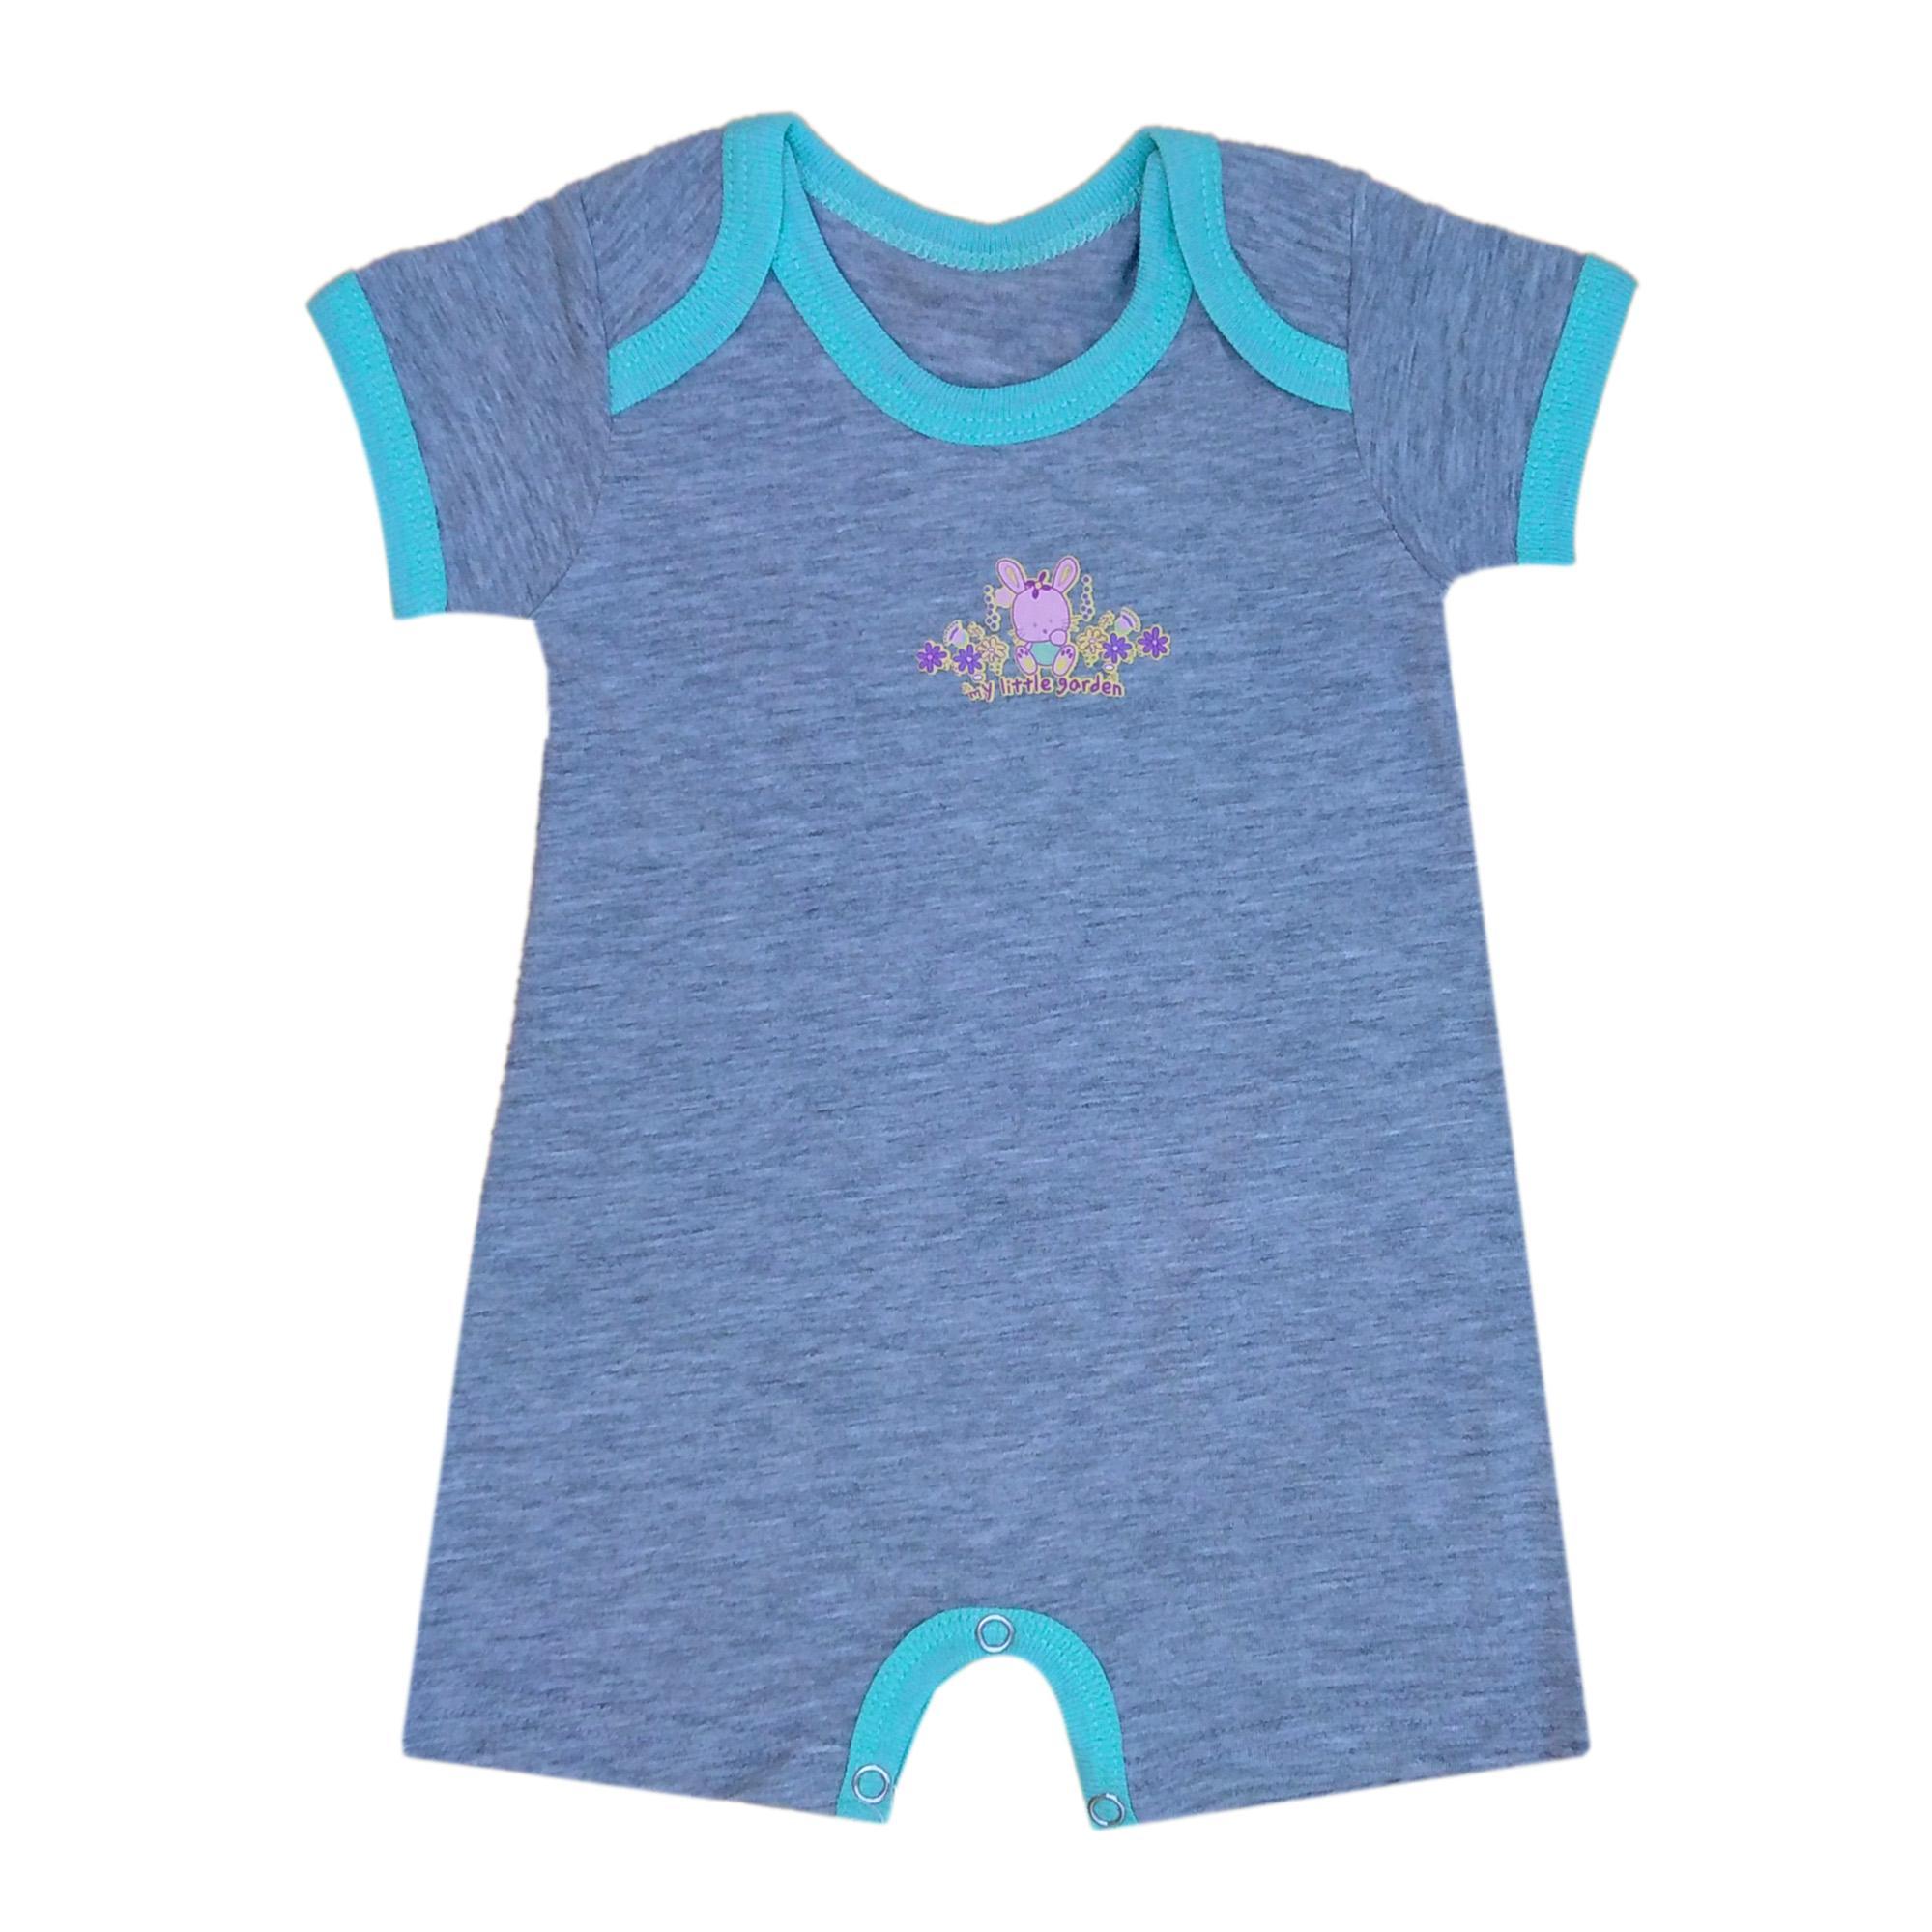 140e5af80e5f Buy Newborn Unisex Bodysuits   One-Pieces Online in Pakistan - Daraz.pk